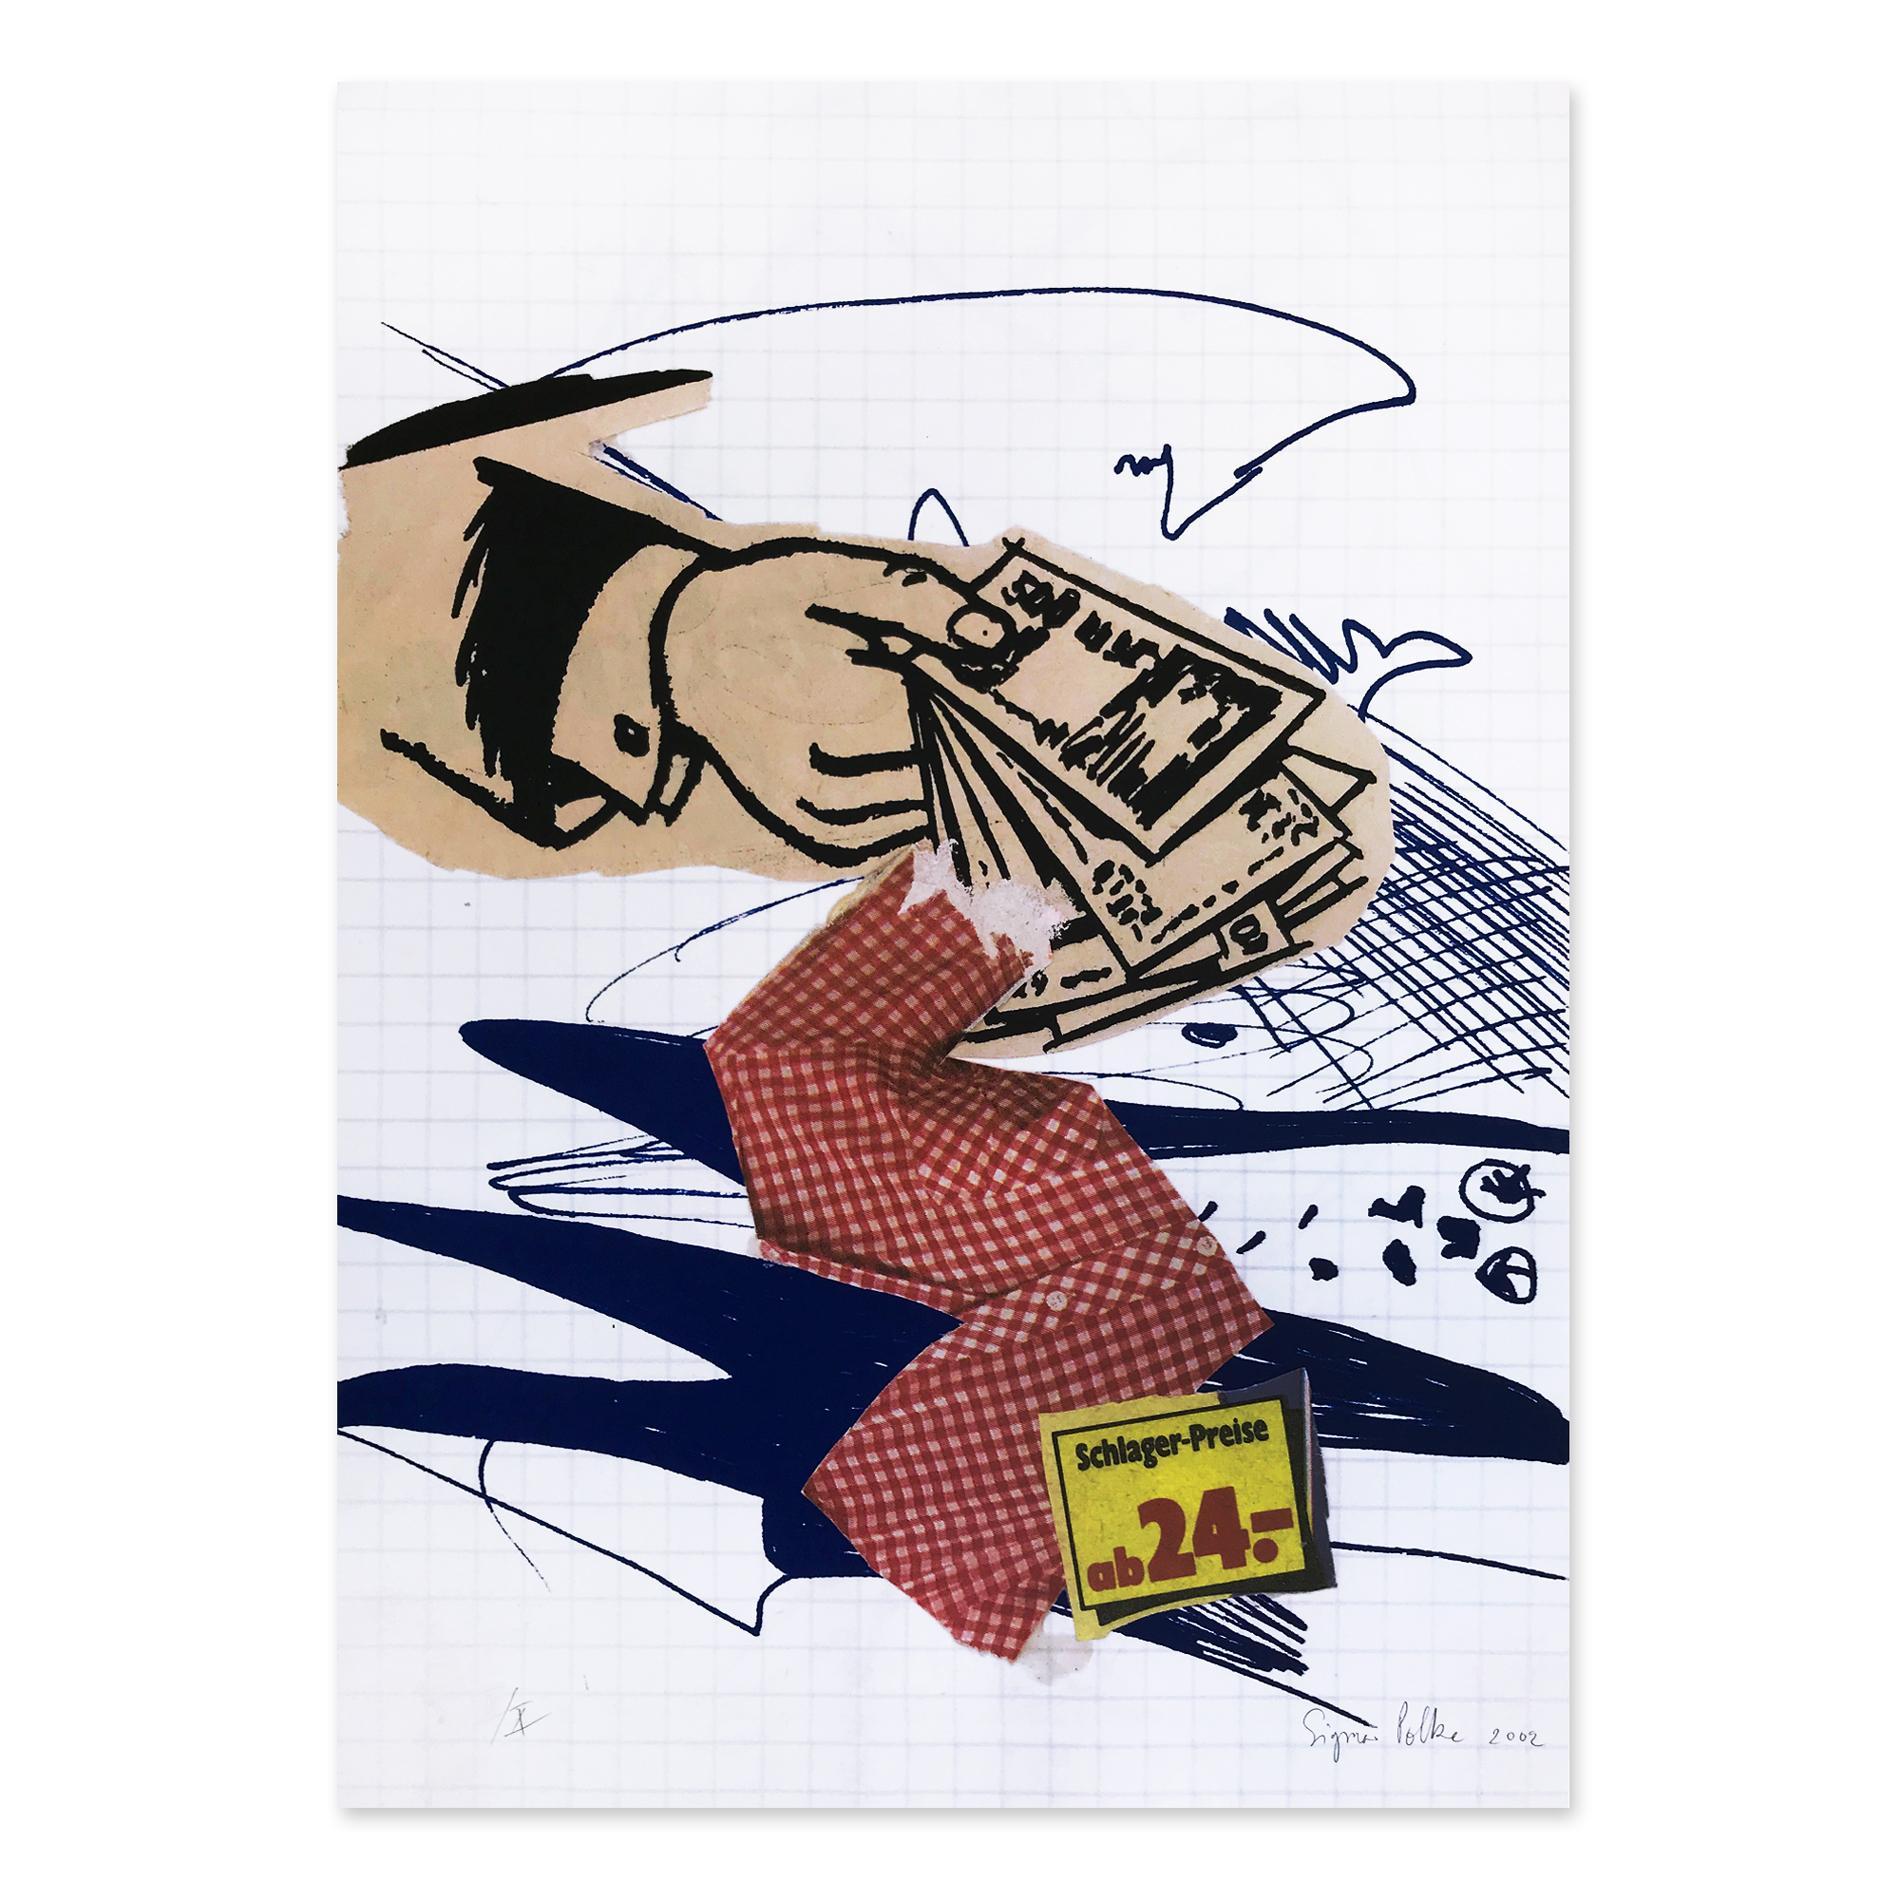 Bargeld Lacht, Pop Art, Capitalist Realism, 21st Century